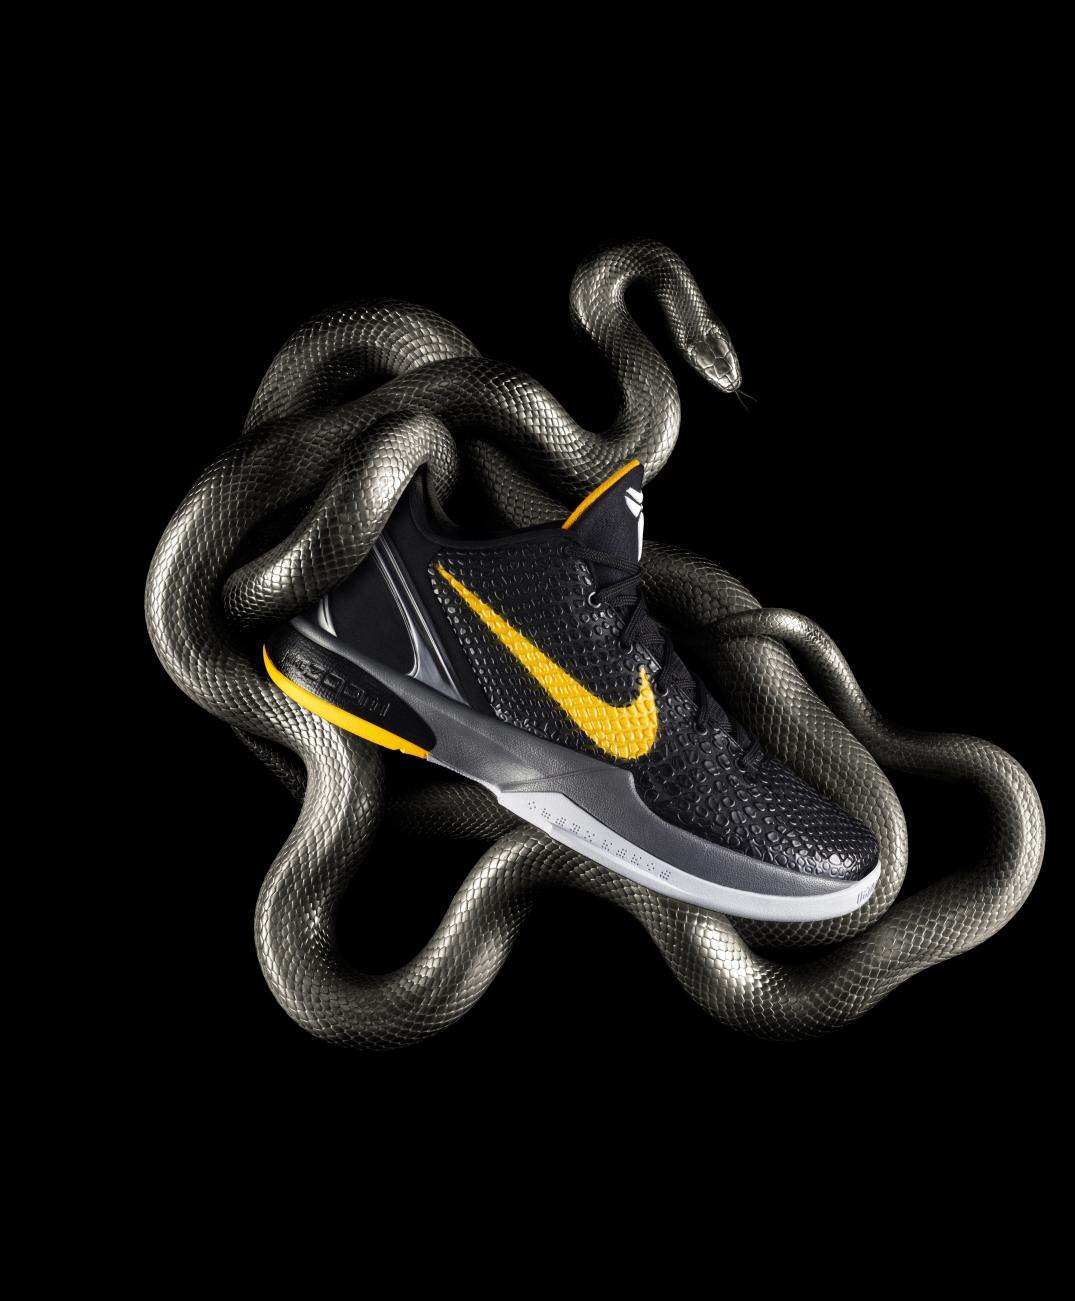 Nike_Zoom_Kobe_VI_Black_Mamba_bk_original 2